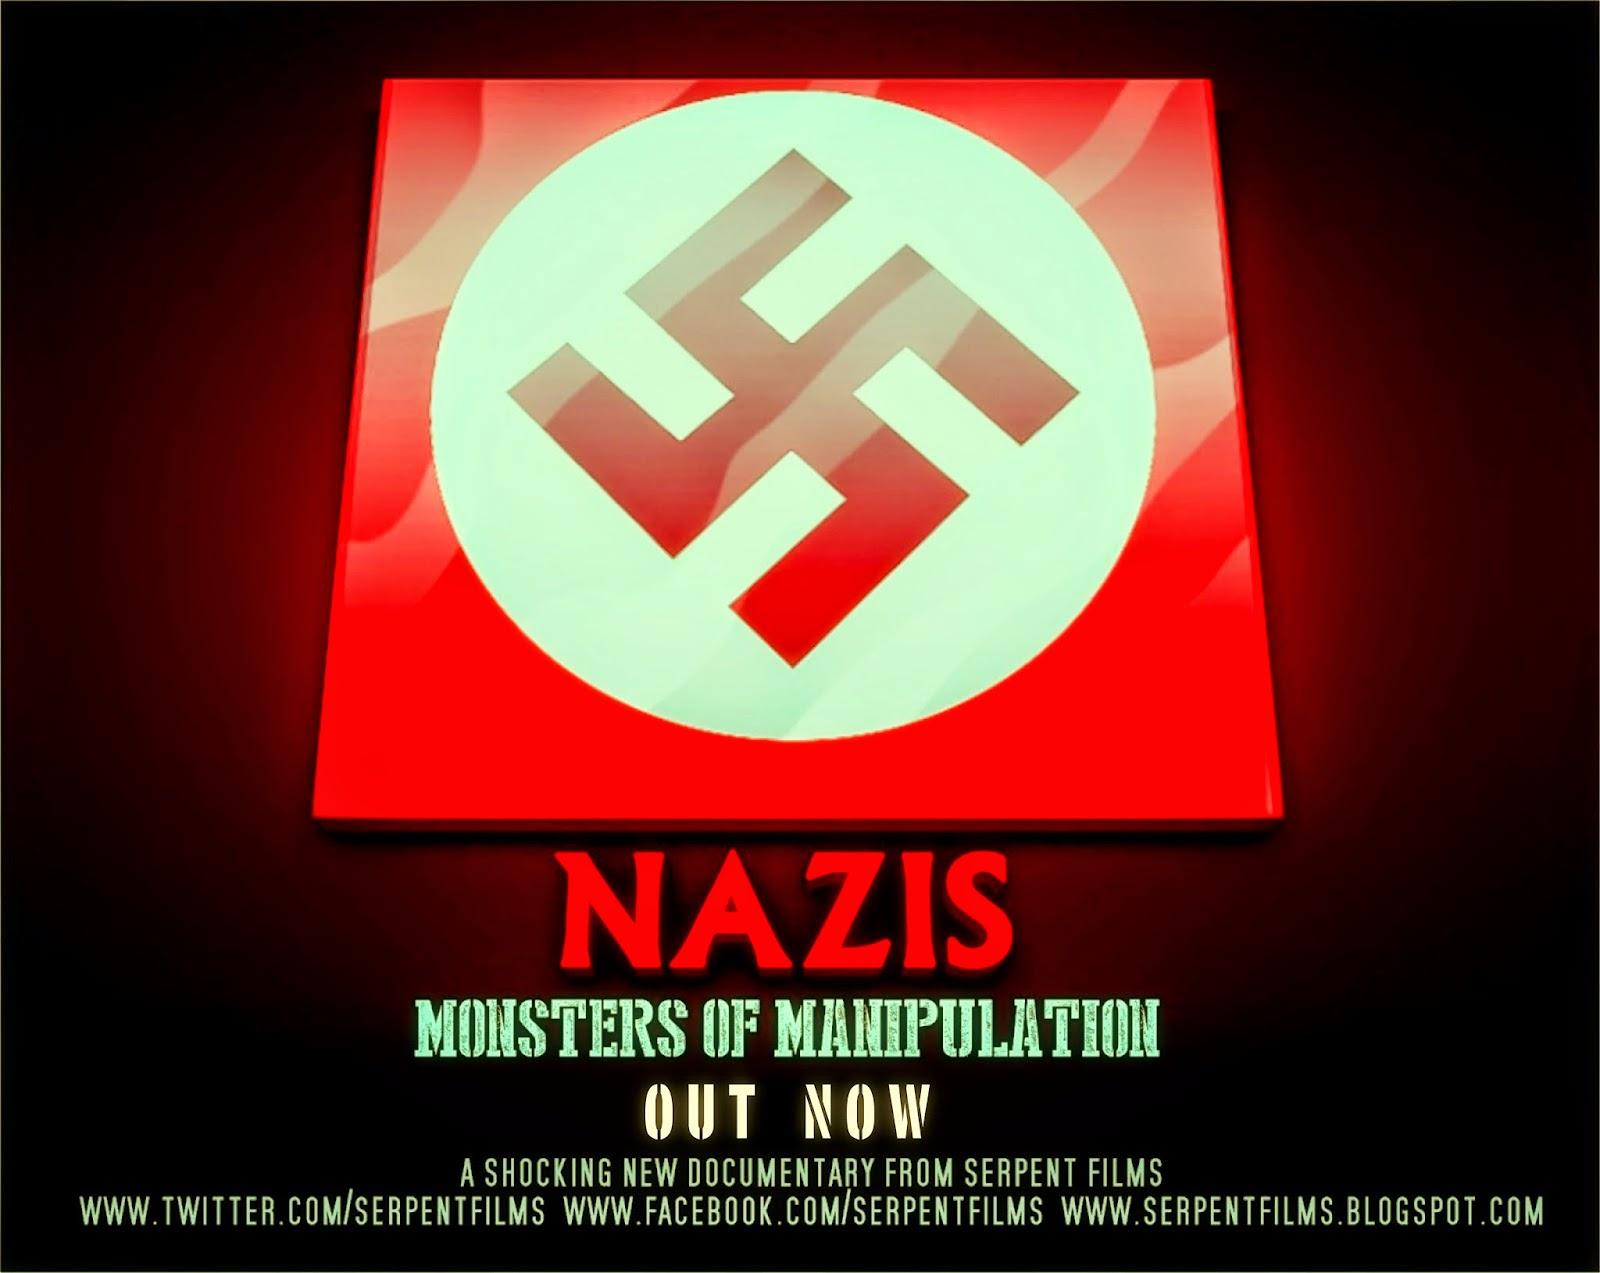 http://www.amazon.com/Nazis-Monsters-of-Manipulation/dp/B00KPY0GNC/ref=sr_1_1?ie=UTF8&qid=1401881819&sr=8-1&keywords=nazis+monsters+of+manipulation